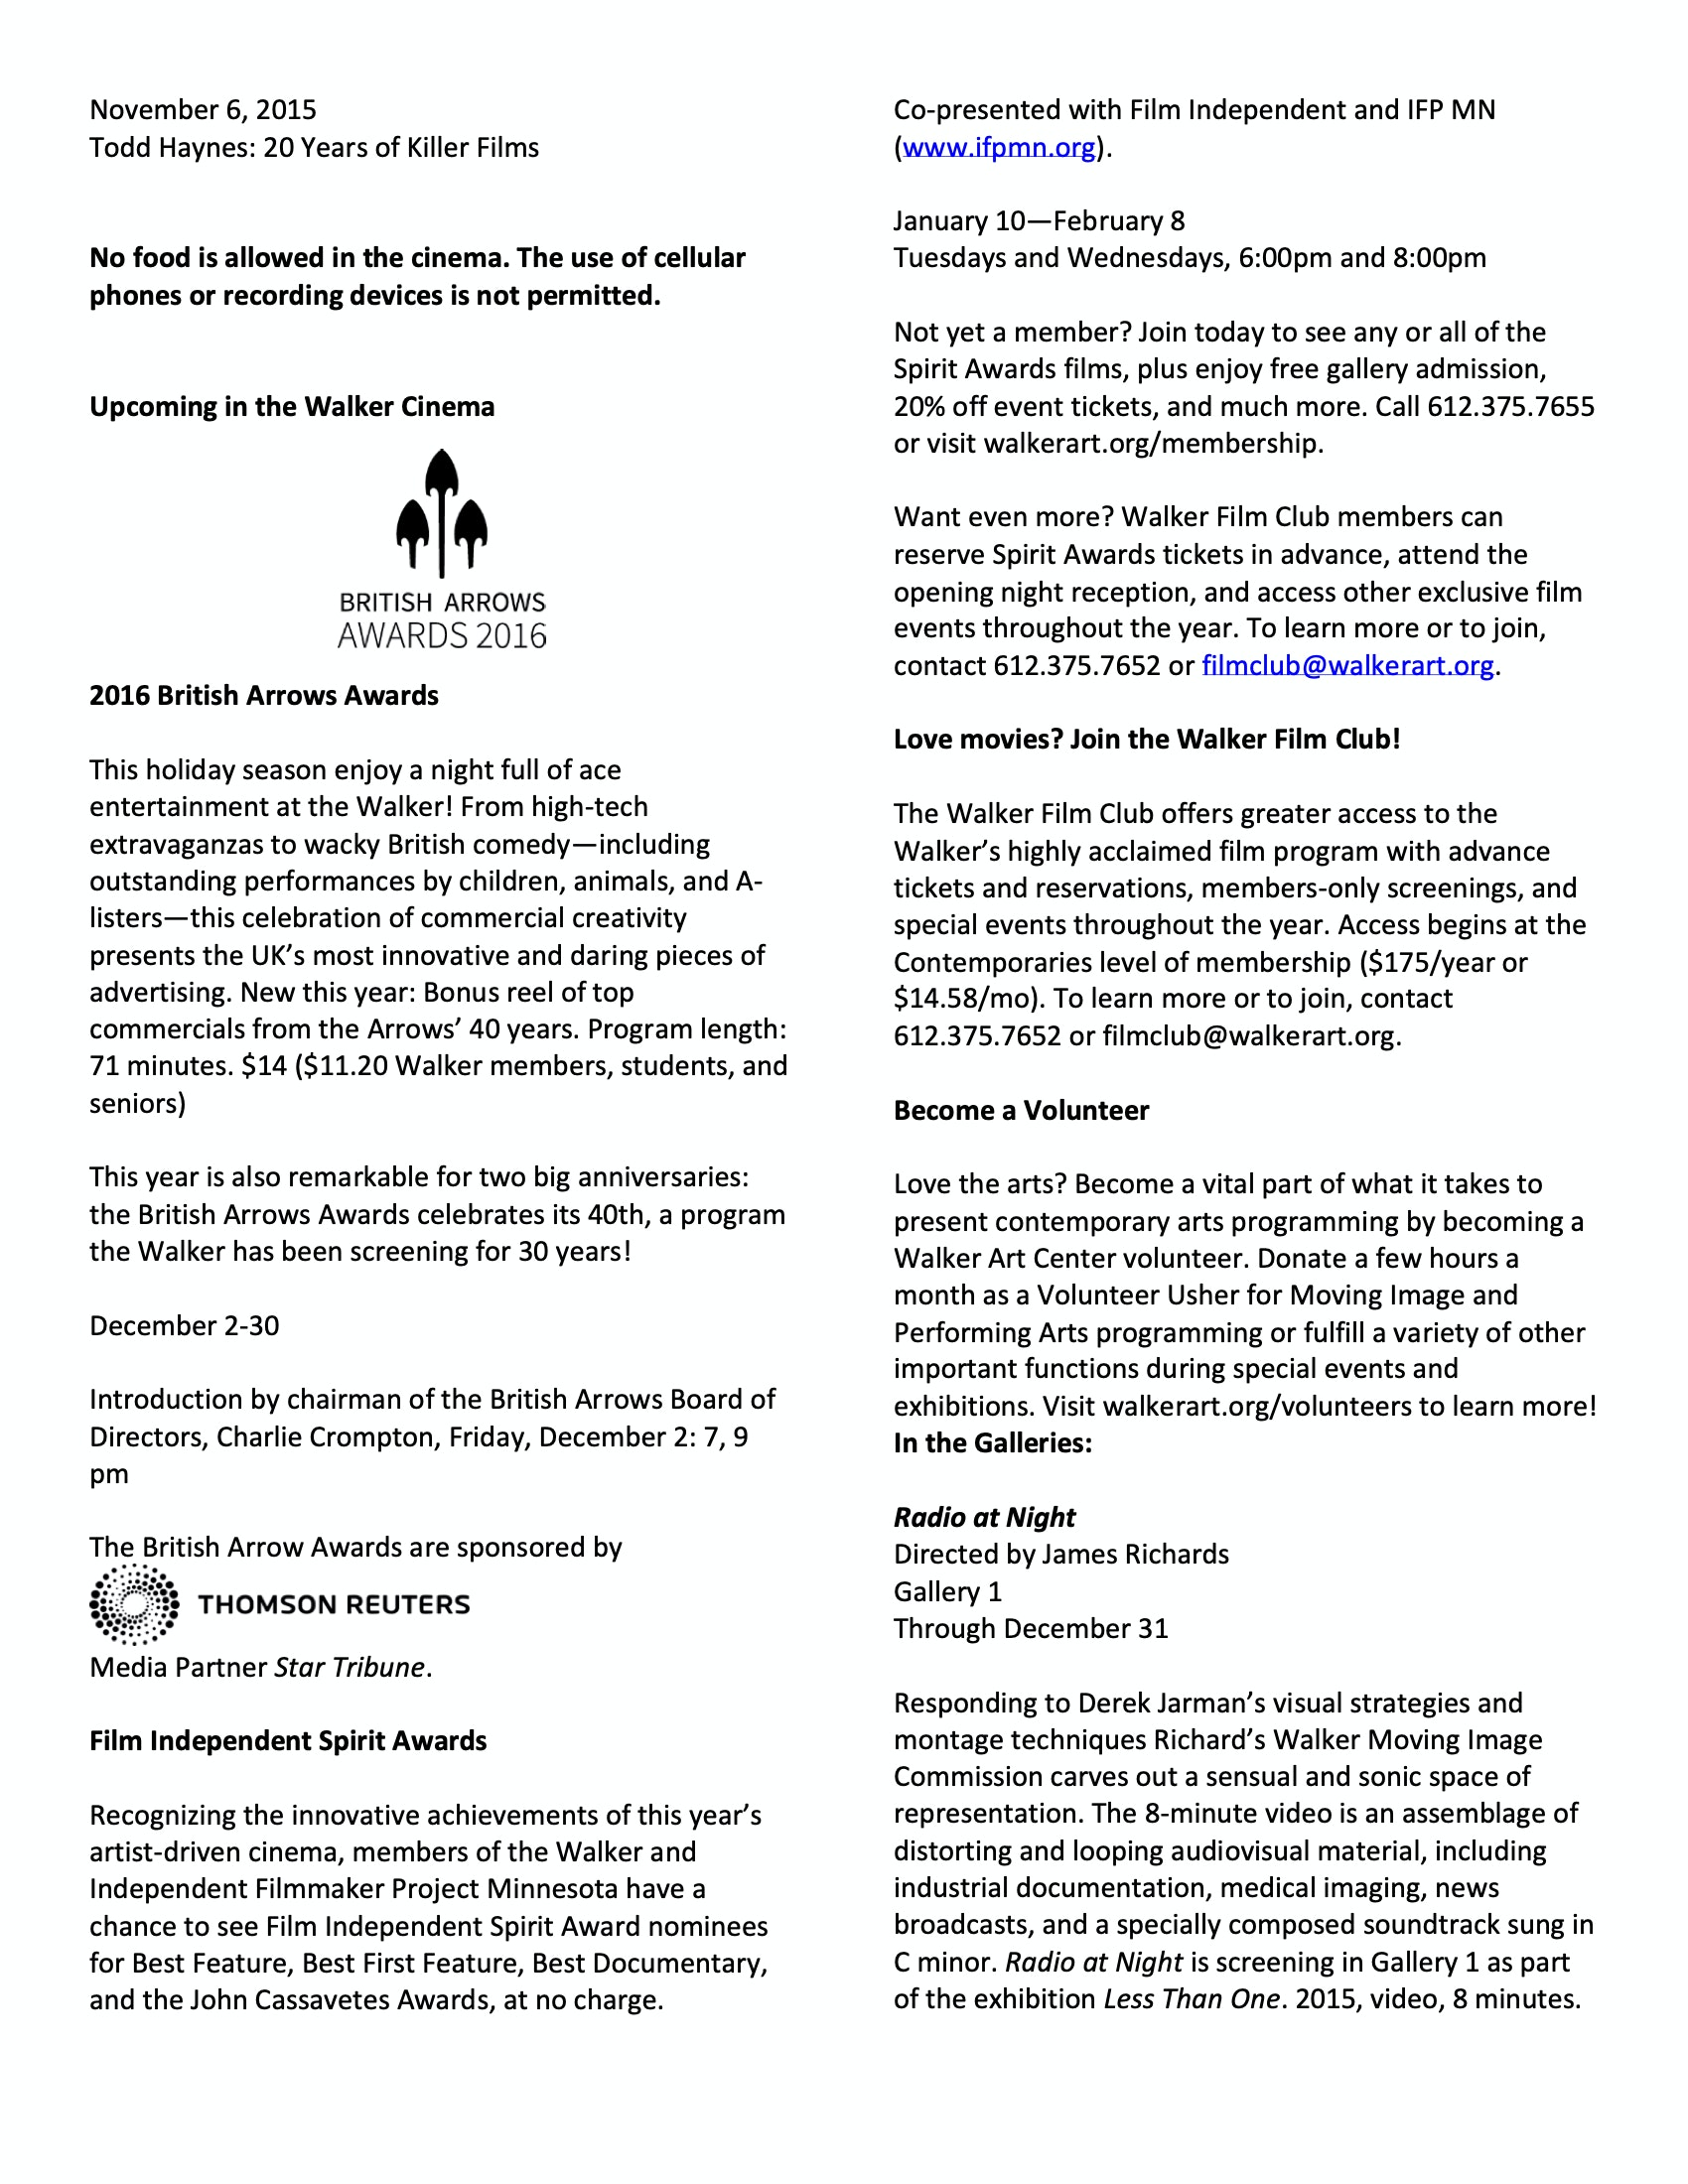 Robert Redford program notes pg 6